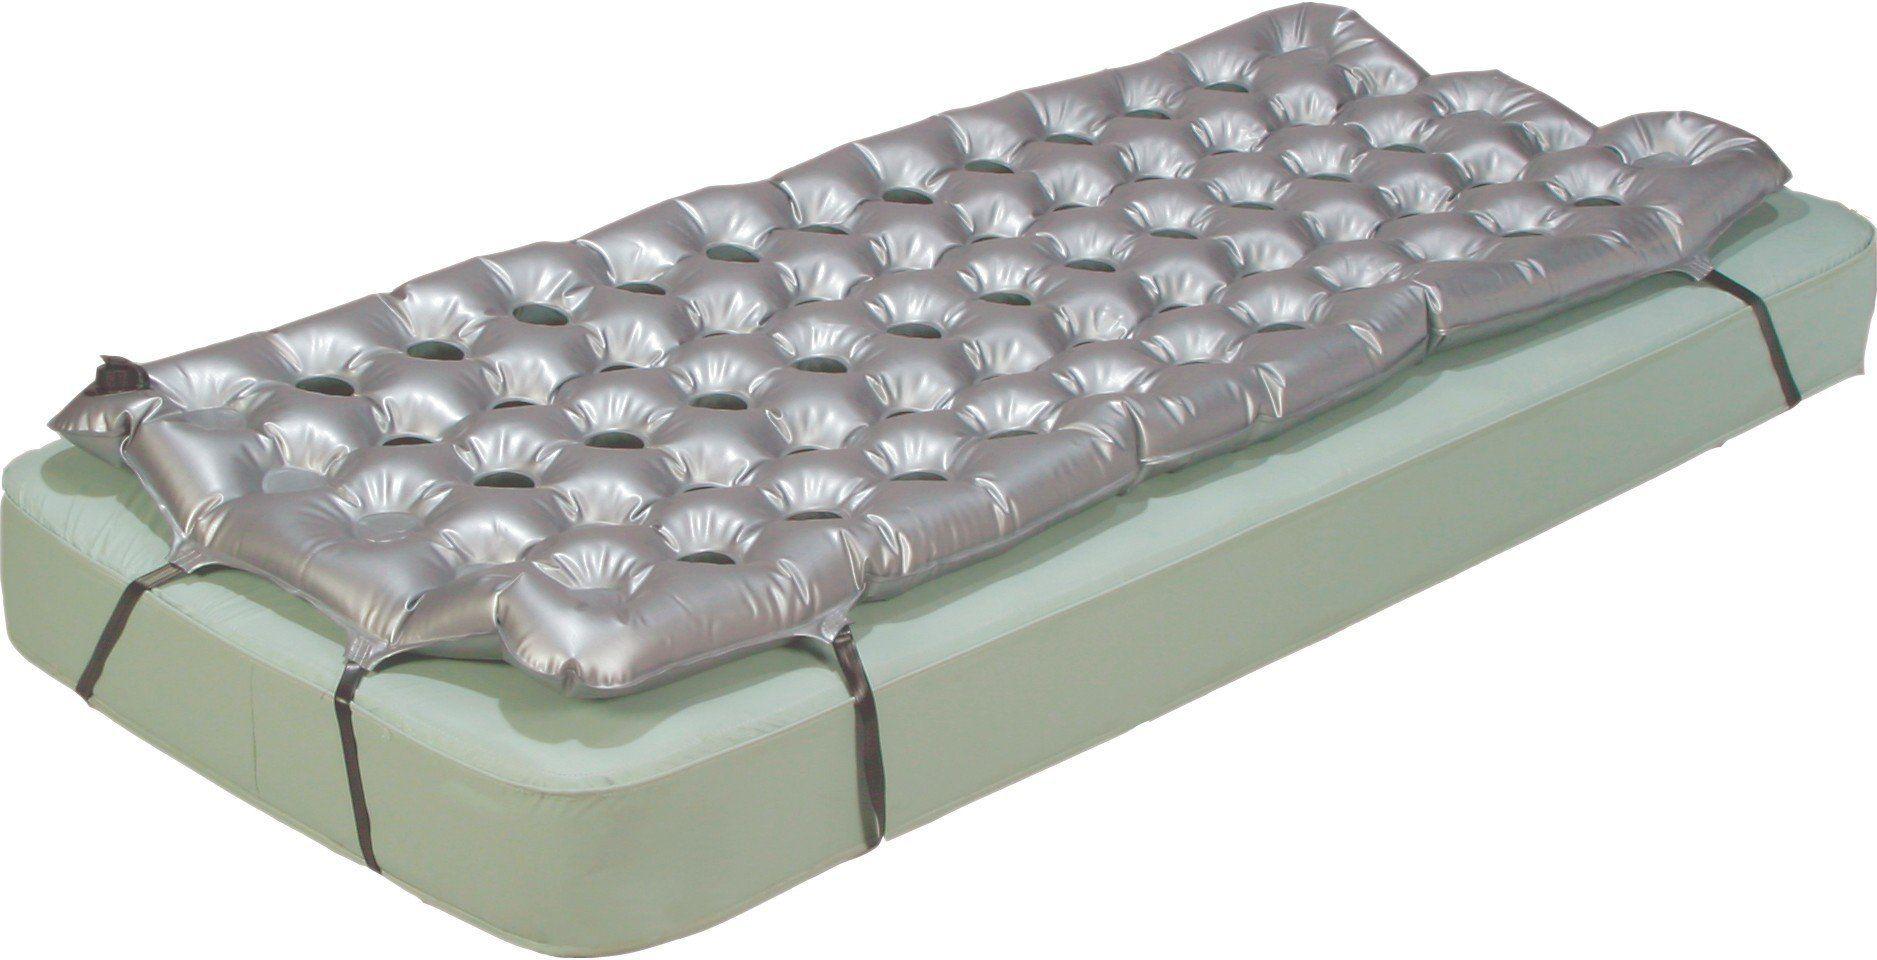 Drive Medical Static Air Mattress Overlay Bed mattress